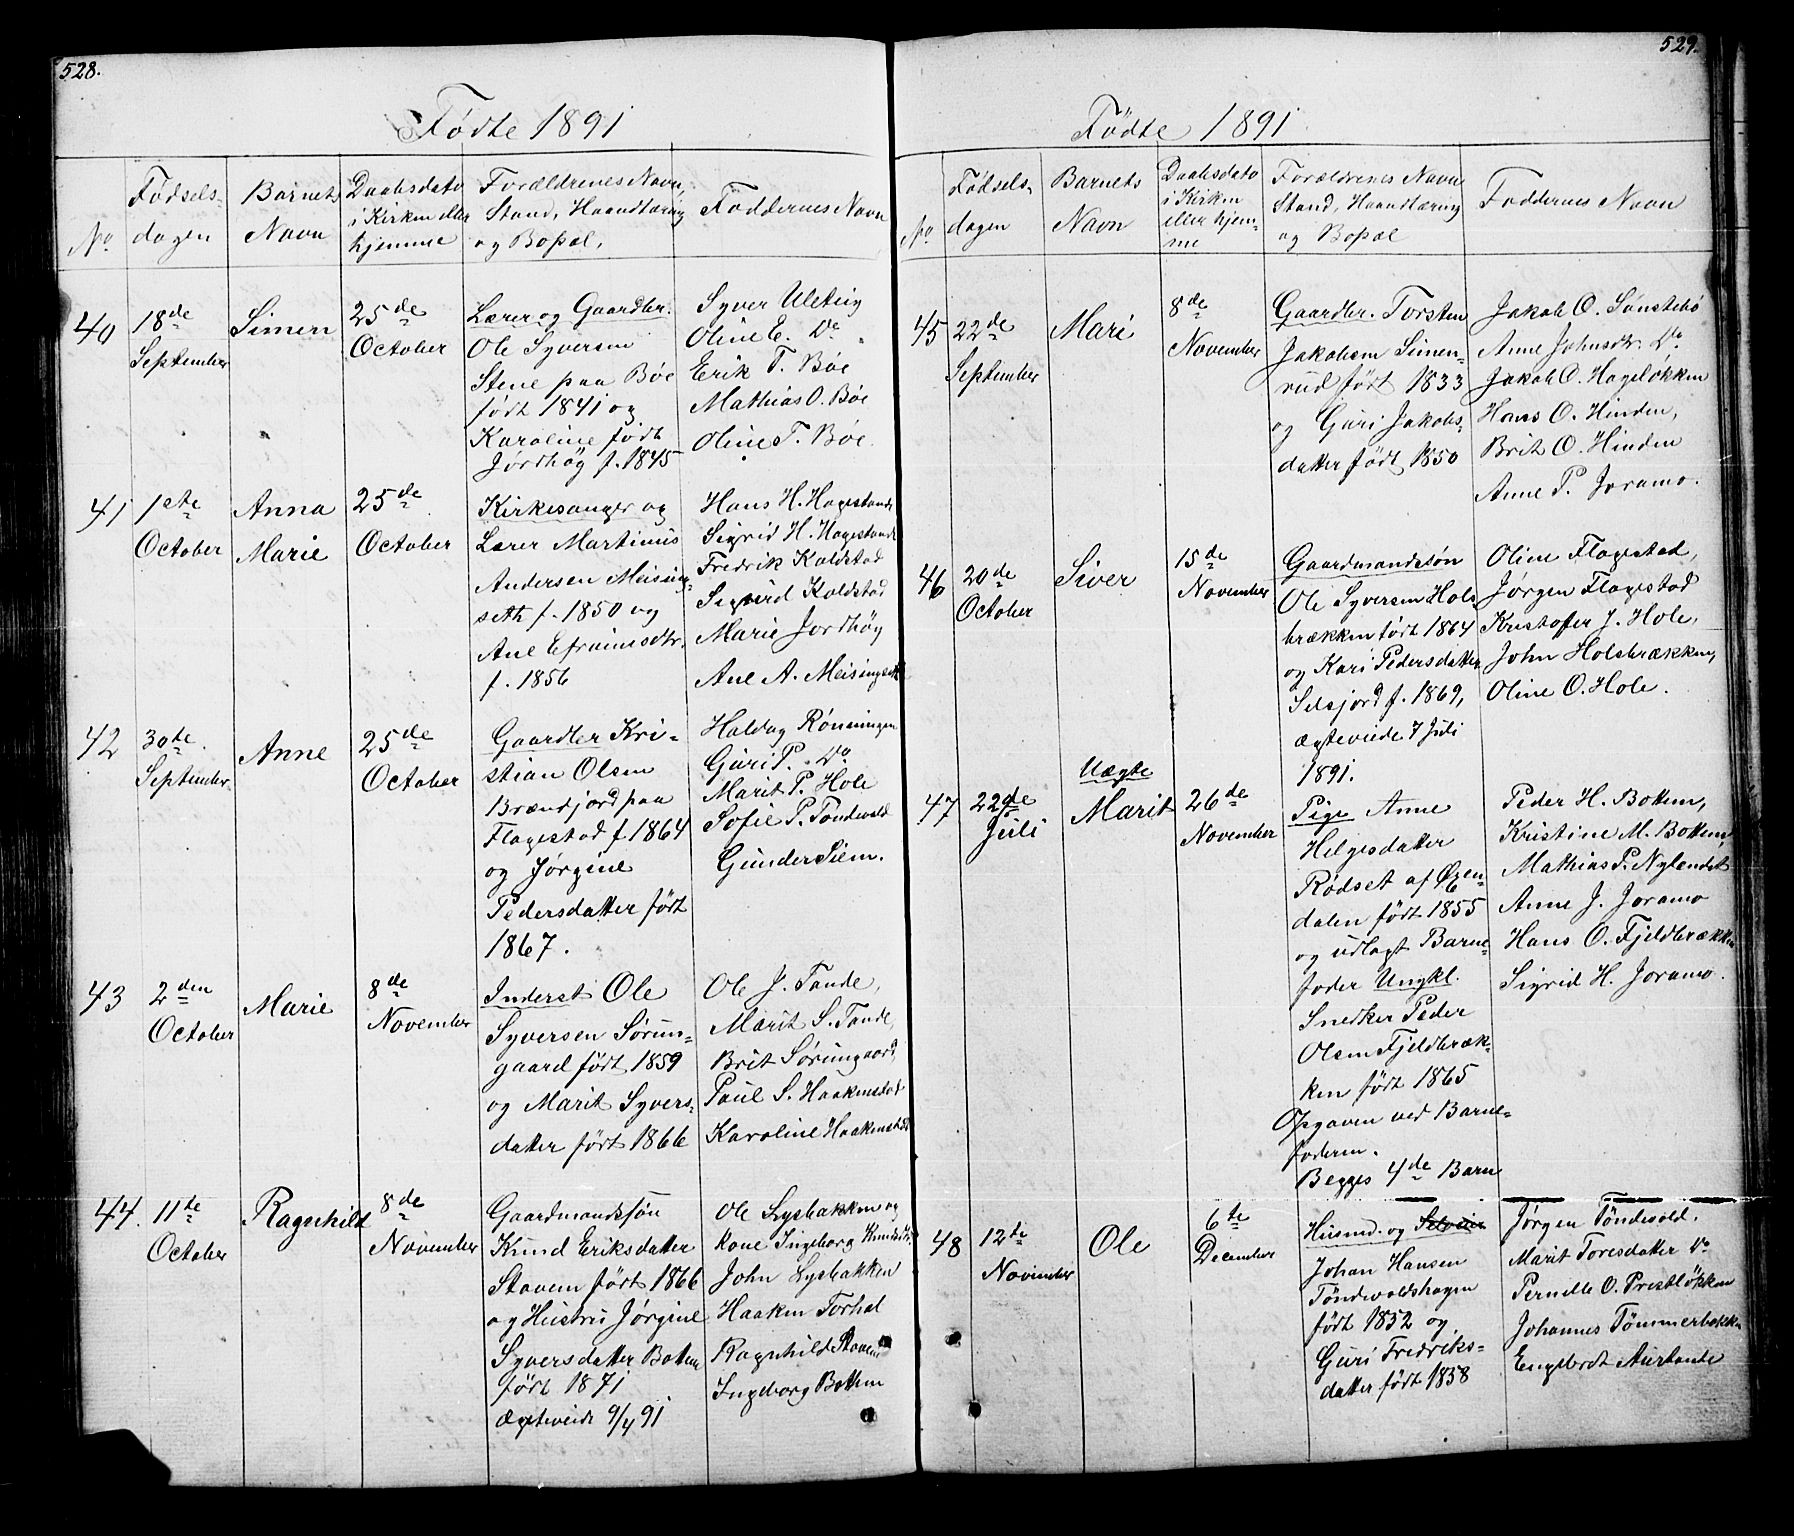 SAH, Lesja prestekontor, Klokkerbok nr. 5, 1850-1894, s. 528-529